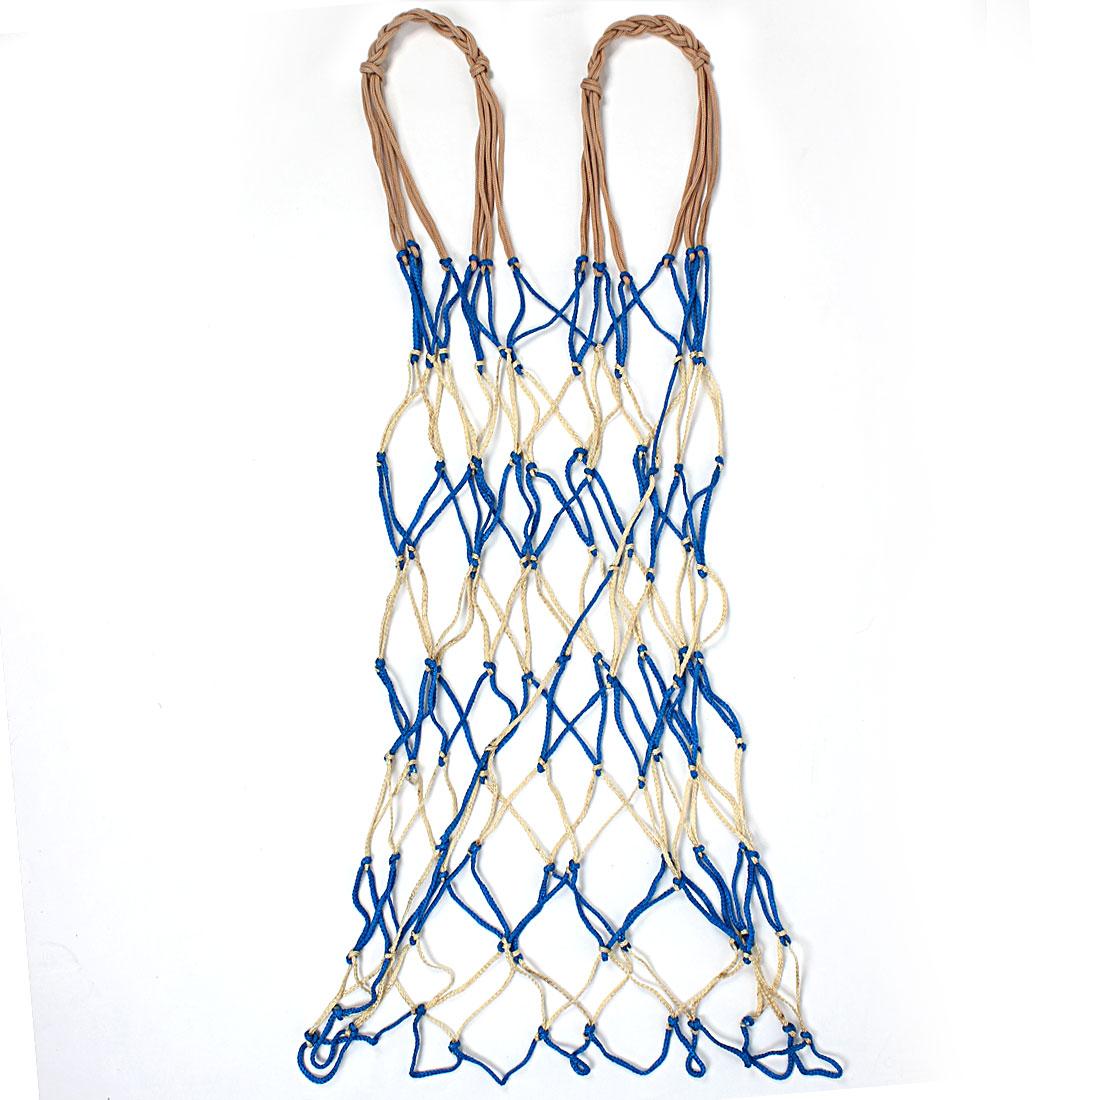 Nylon Net Bag Ball Carry Mesh Basketball Football Soccer Yellow&Blue